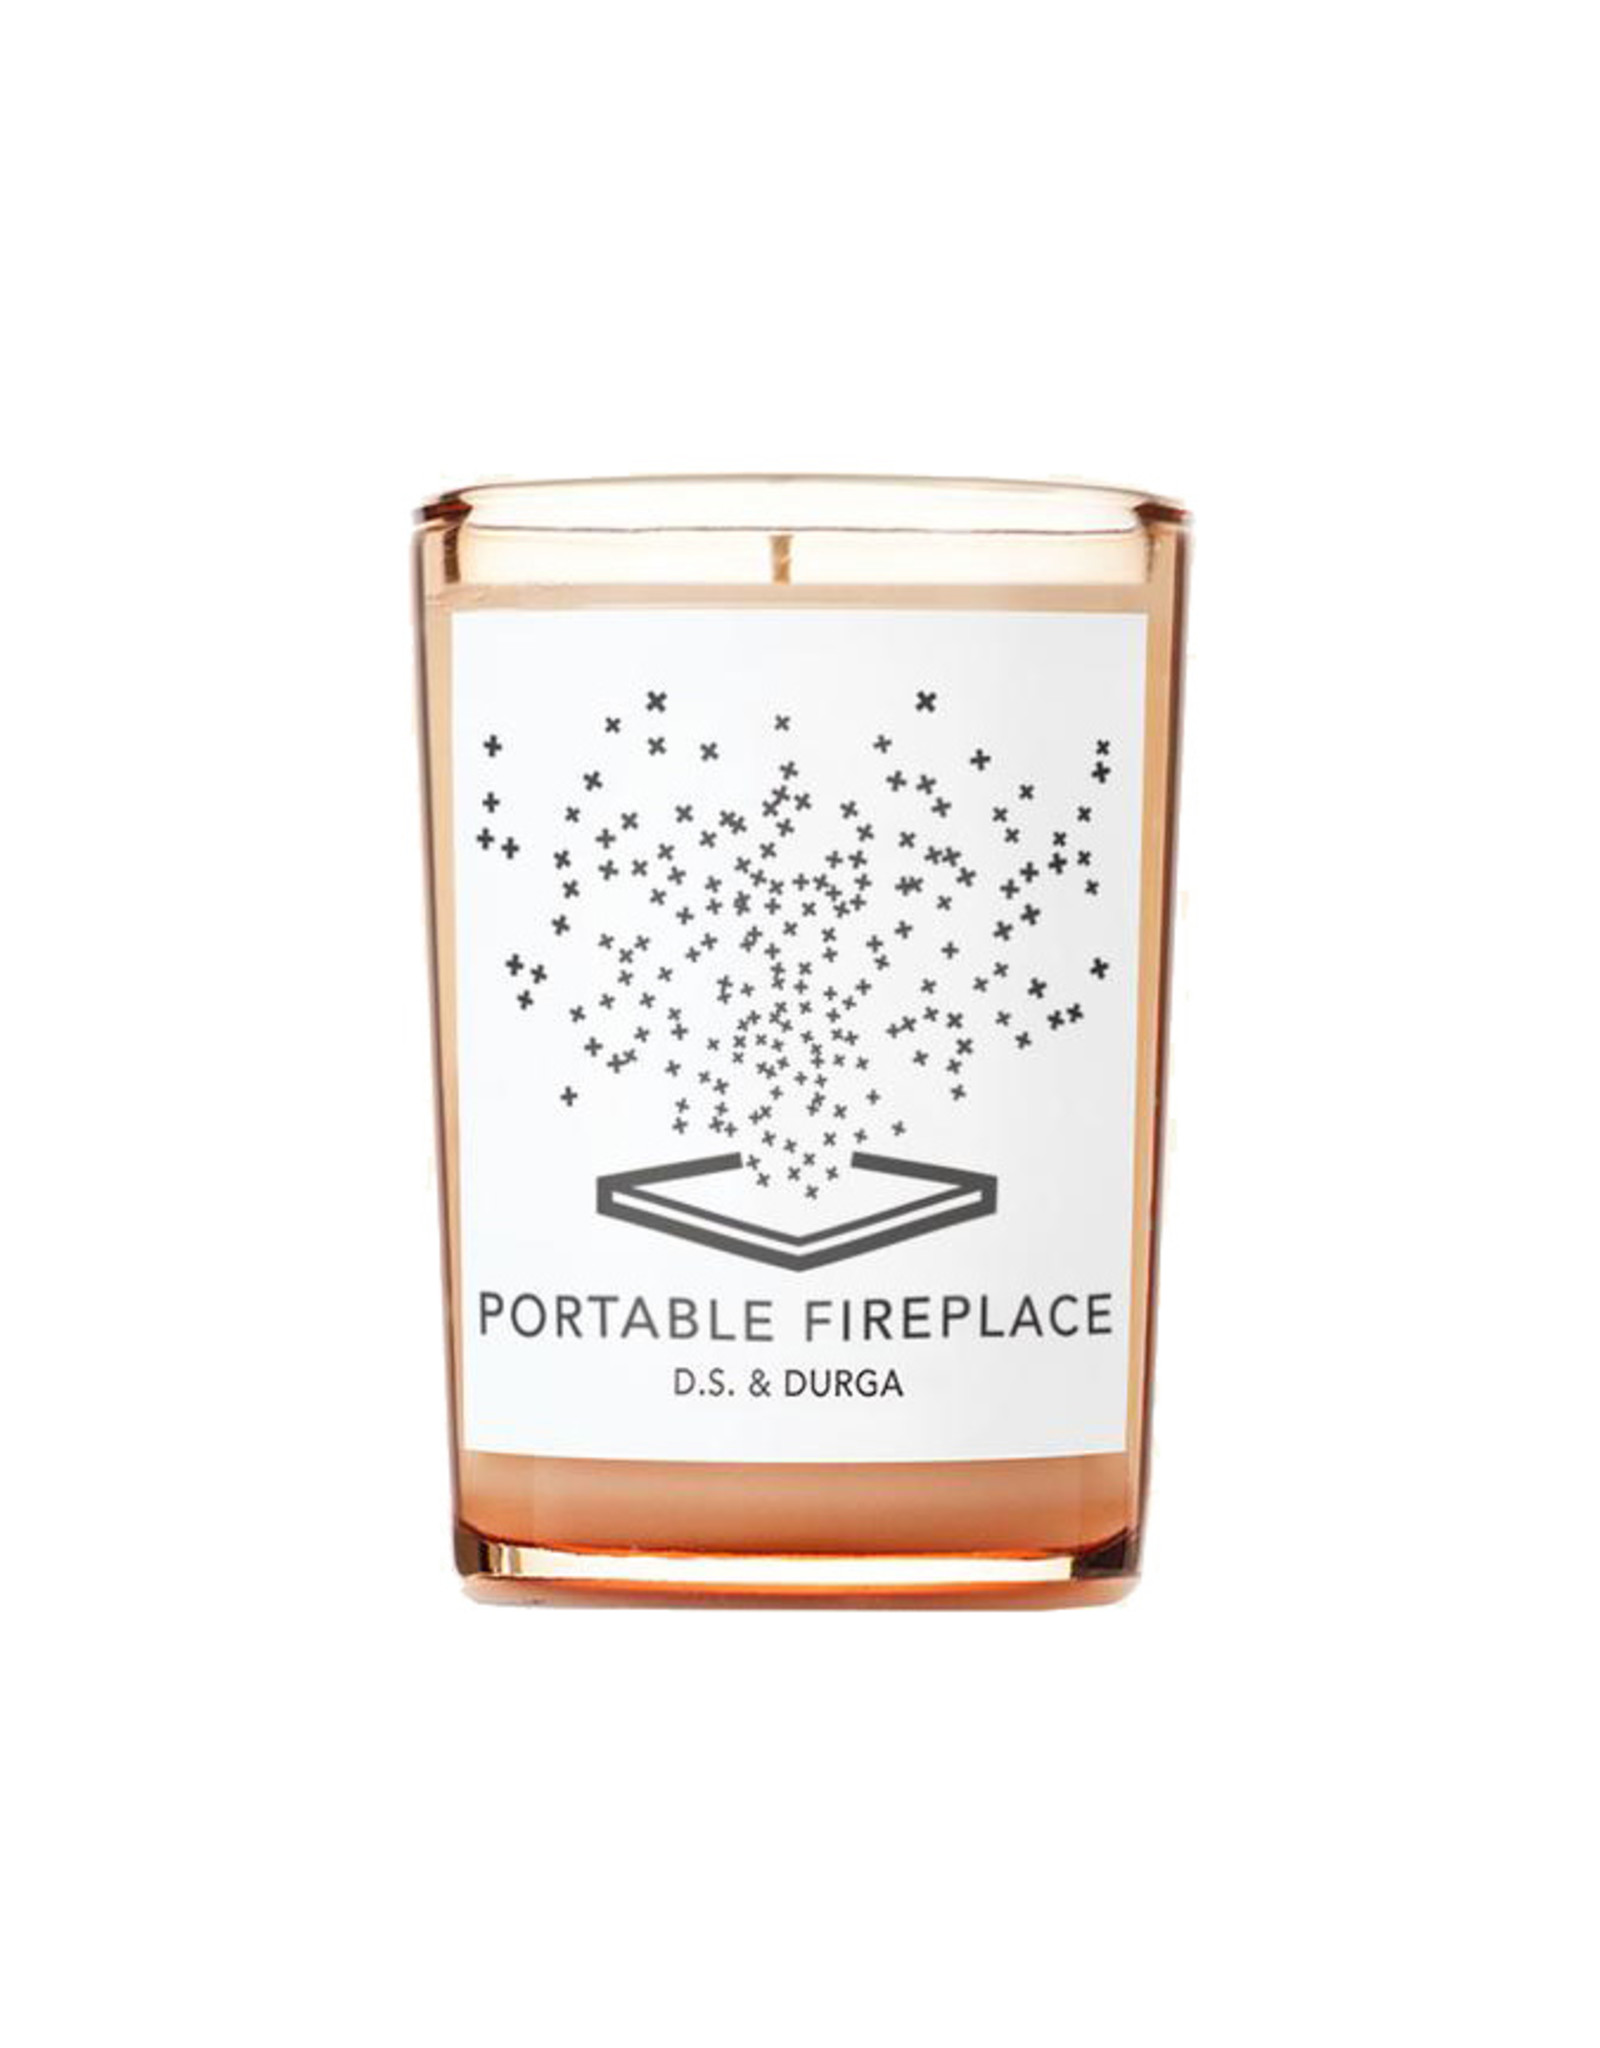 D.S. & DURGA Portable Fireplace - Candle - 7oz.